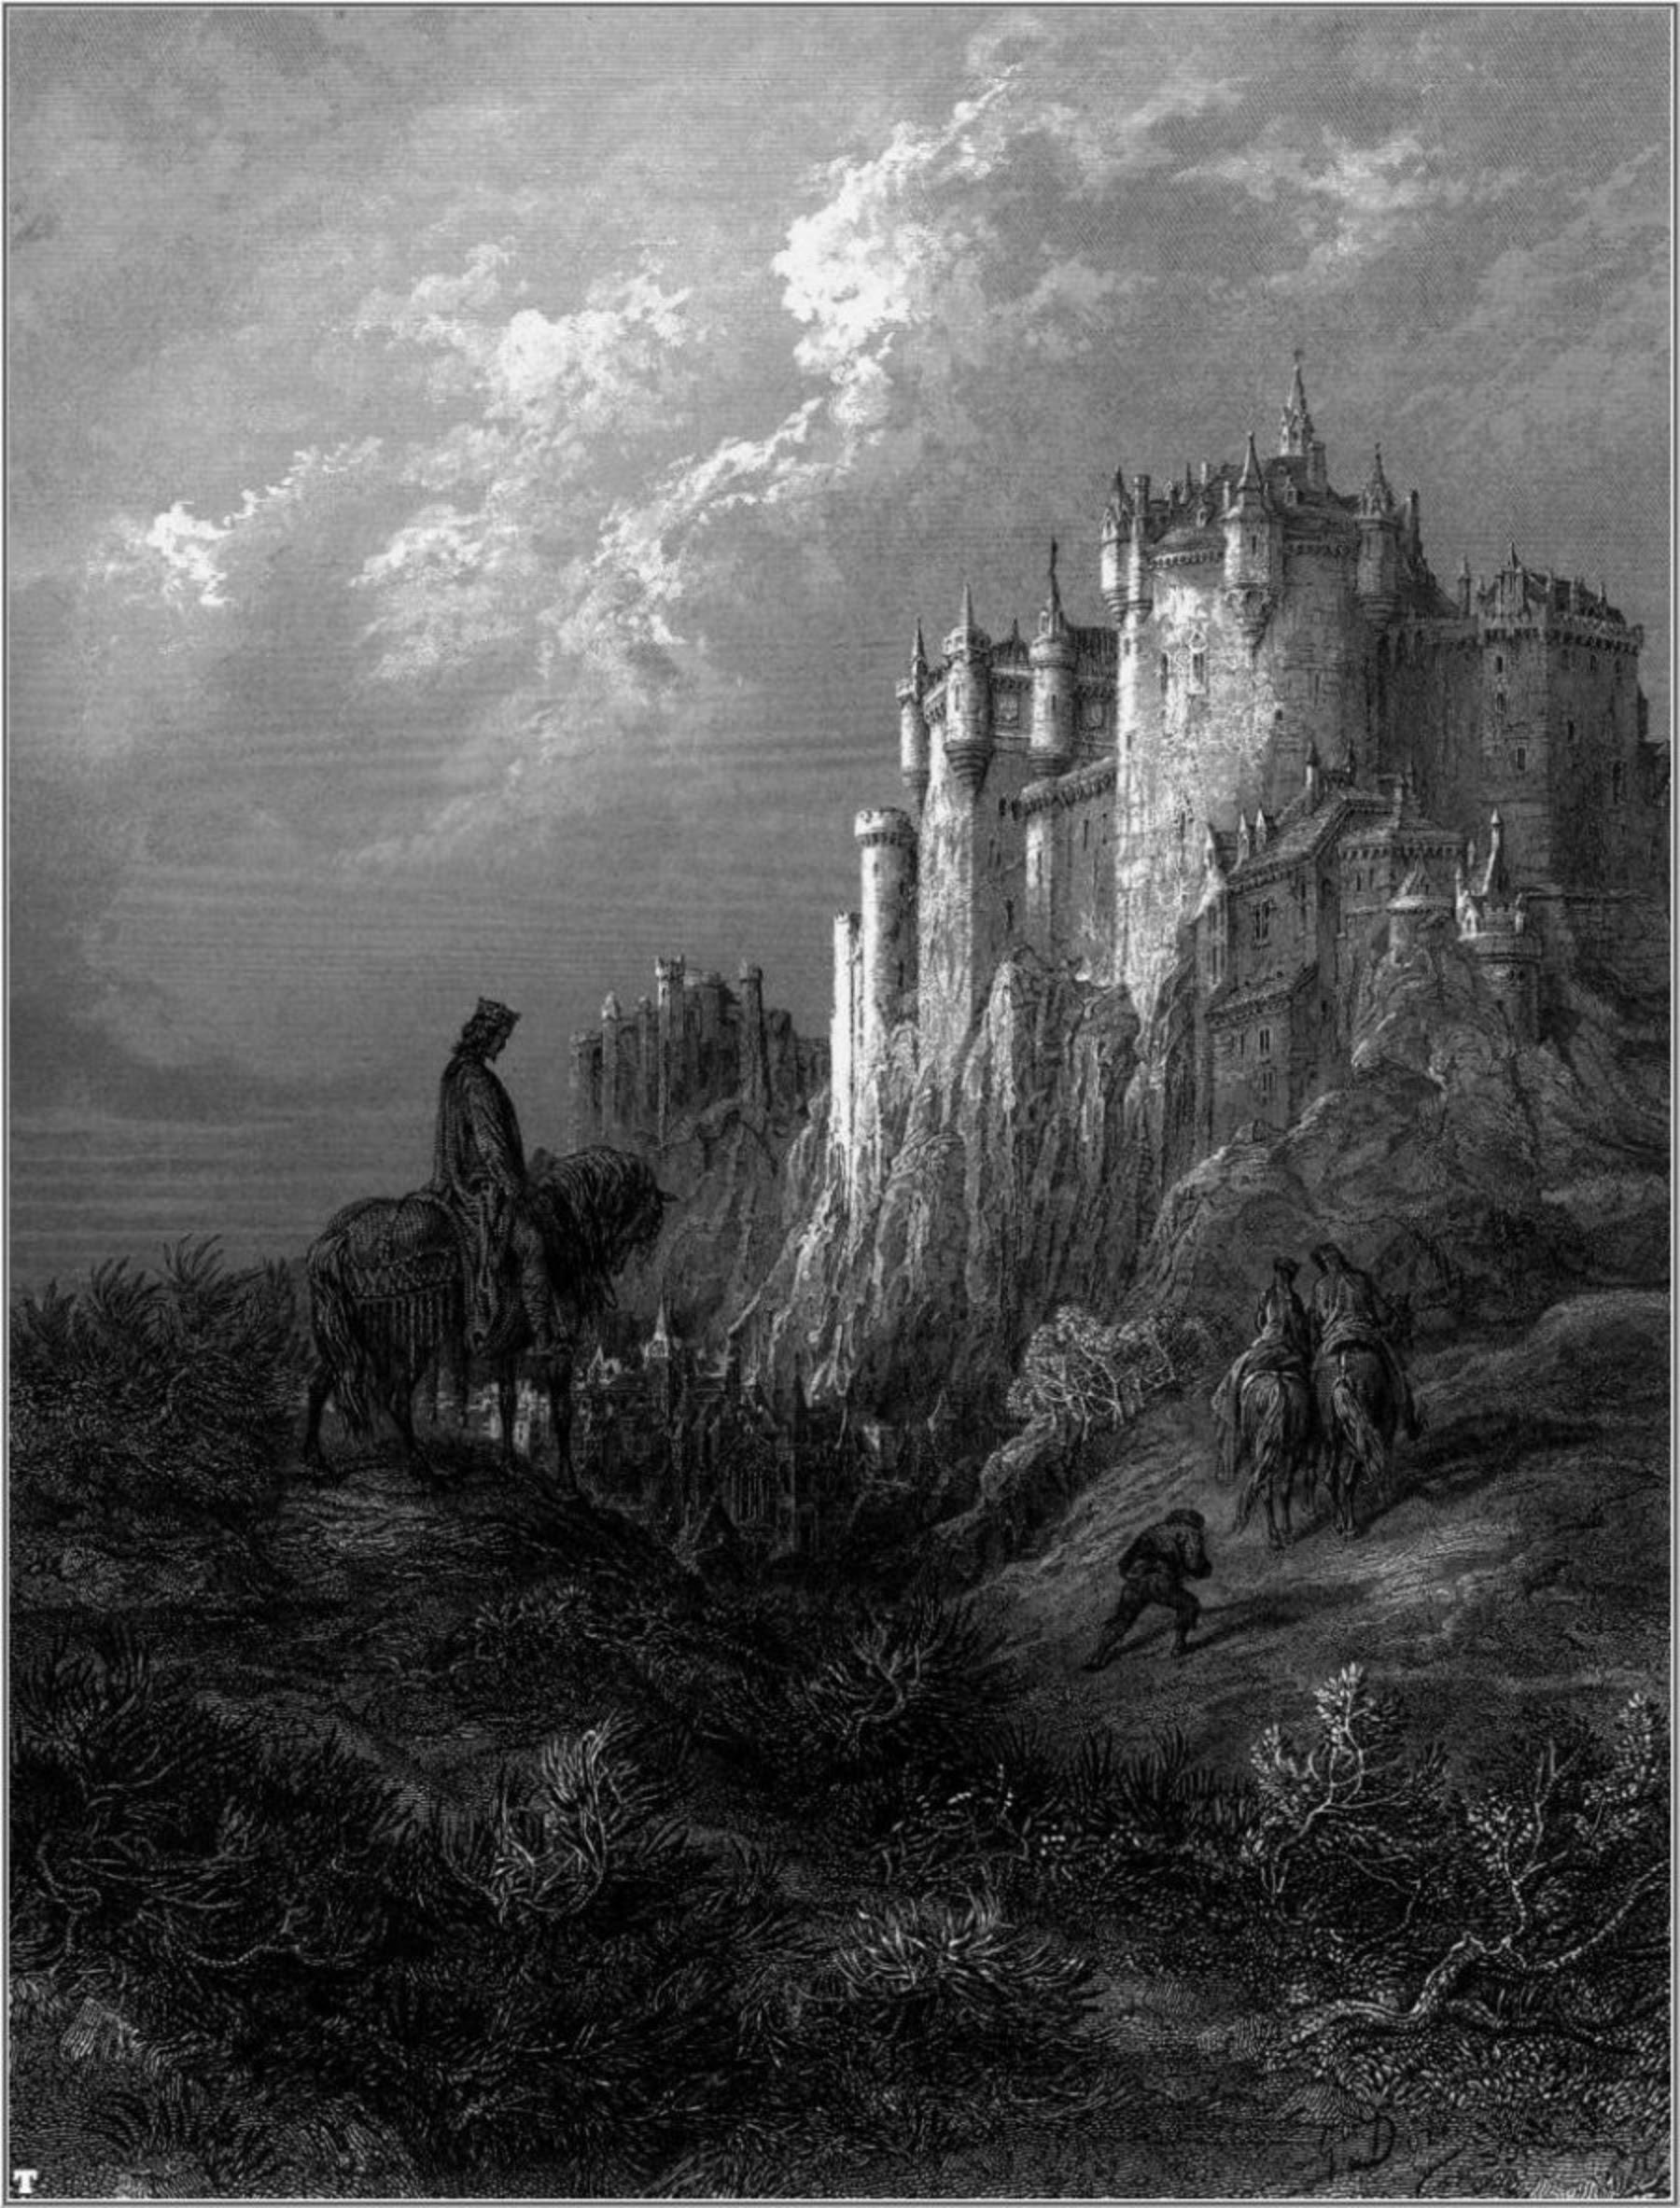 http://upload.wikimedia.org/wikipedia/commons/b/b7/Idylls_of_the_King_3.jpg